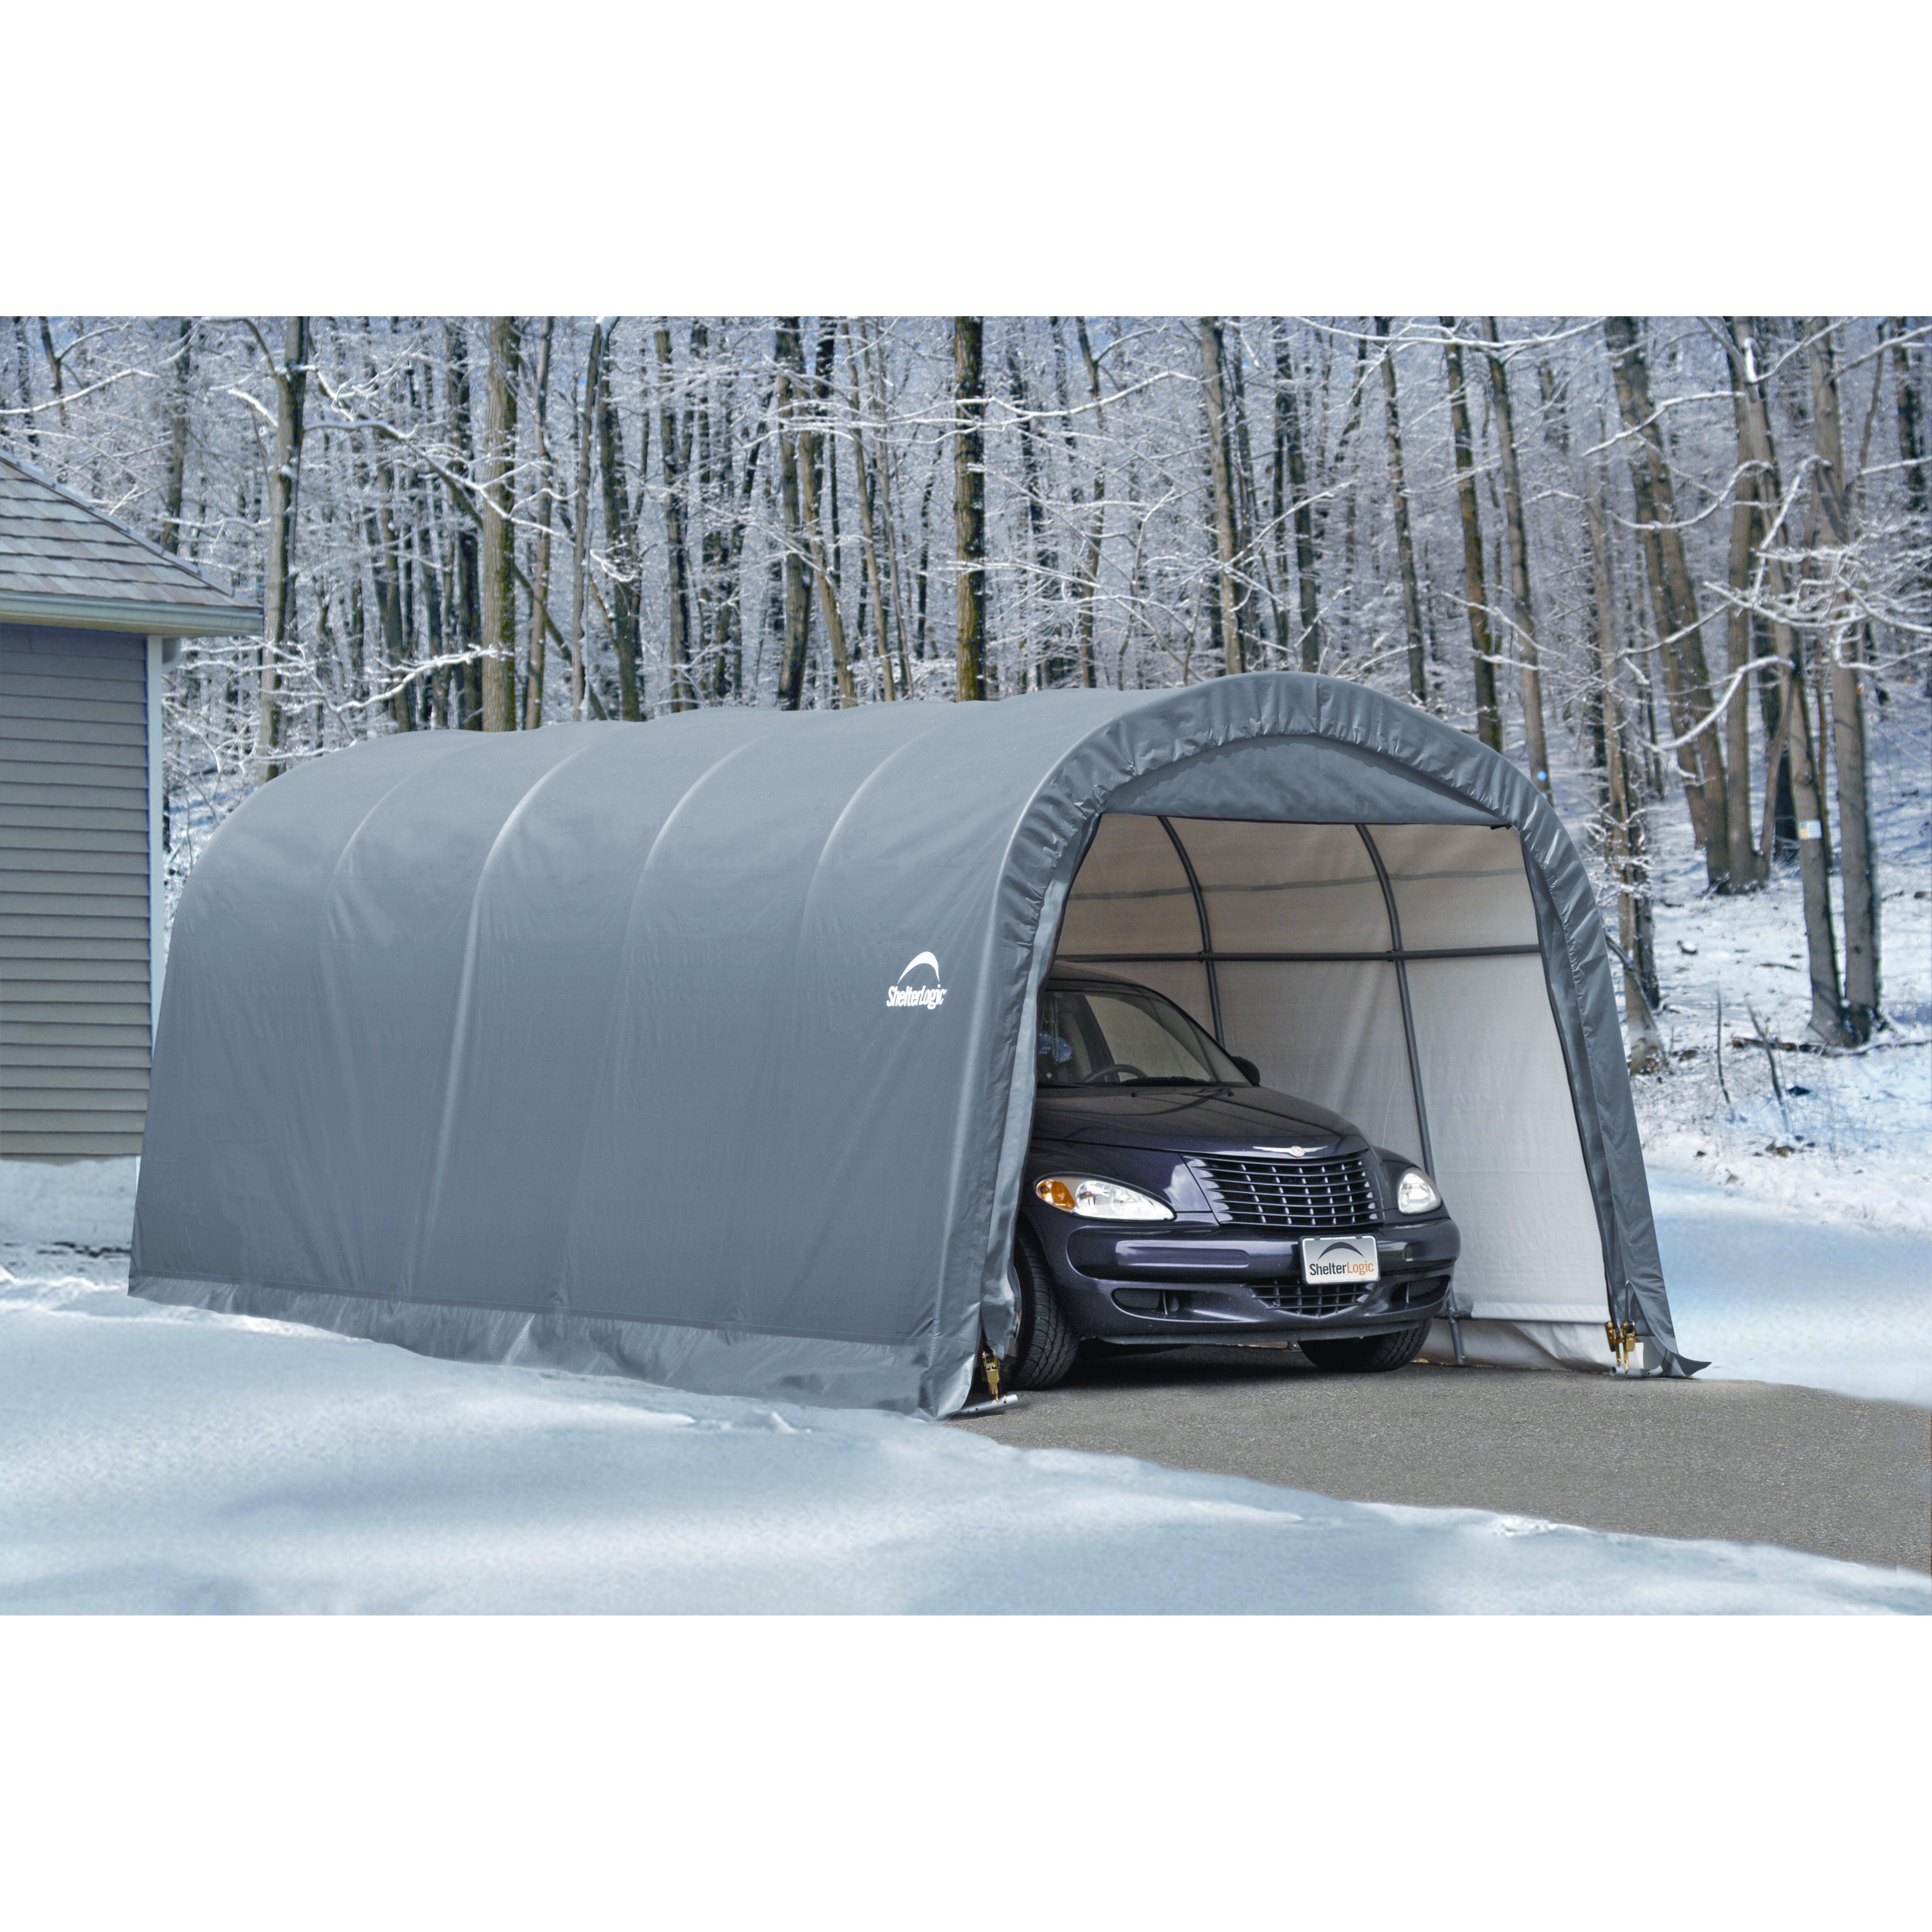 Shelterlogic 10 20 Garage Orshlends : Shelterlogic ft w d garage reviews wayfair